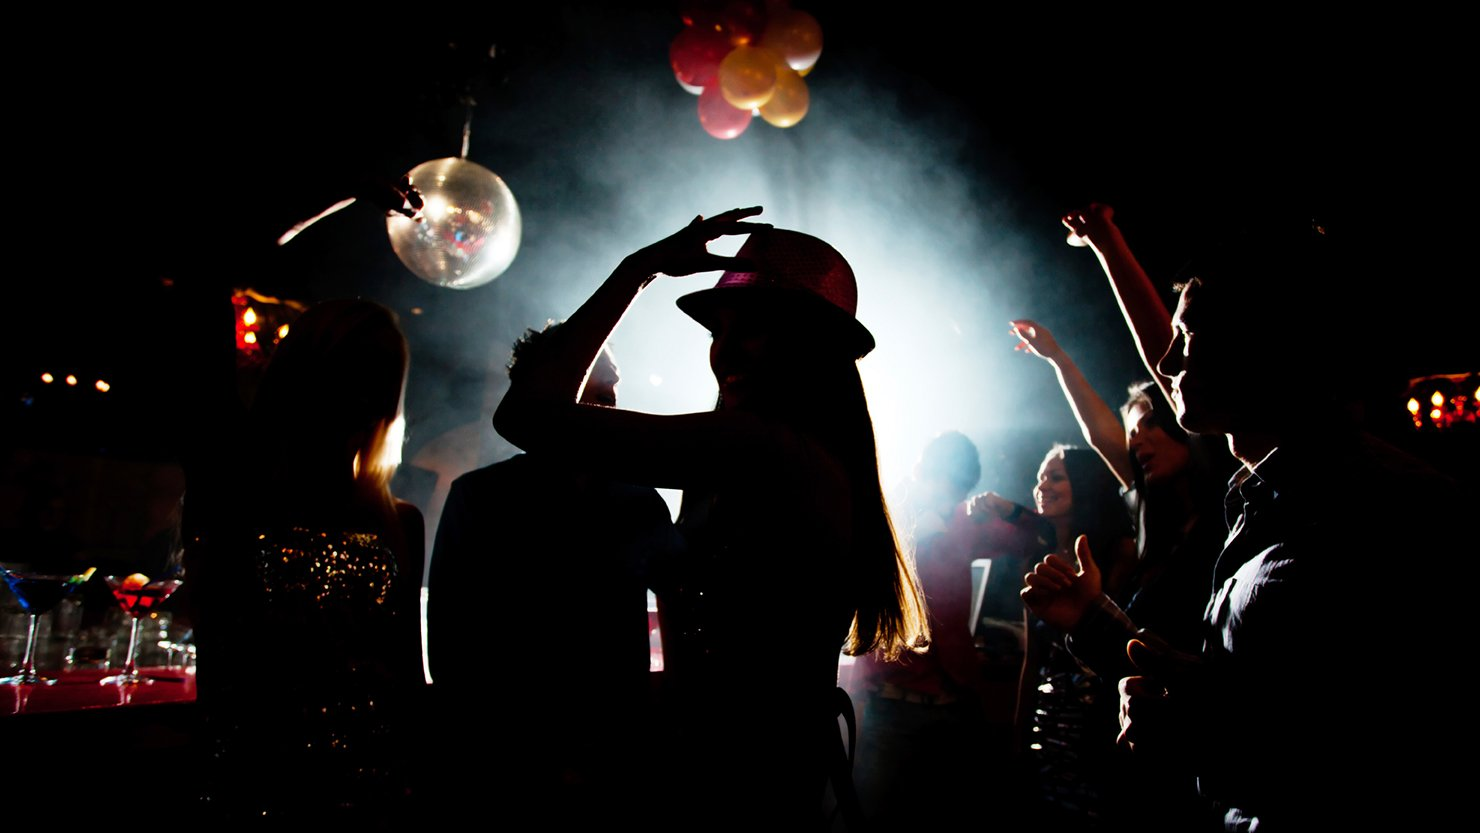 CHAUVET DJ Mini Strobe LED Compact Strobe Light/Party Light | Laser & Strobe Effects